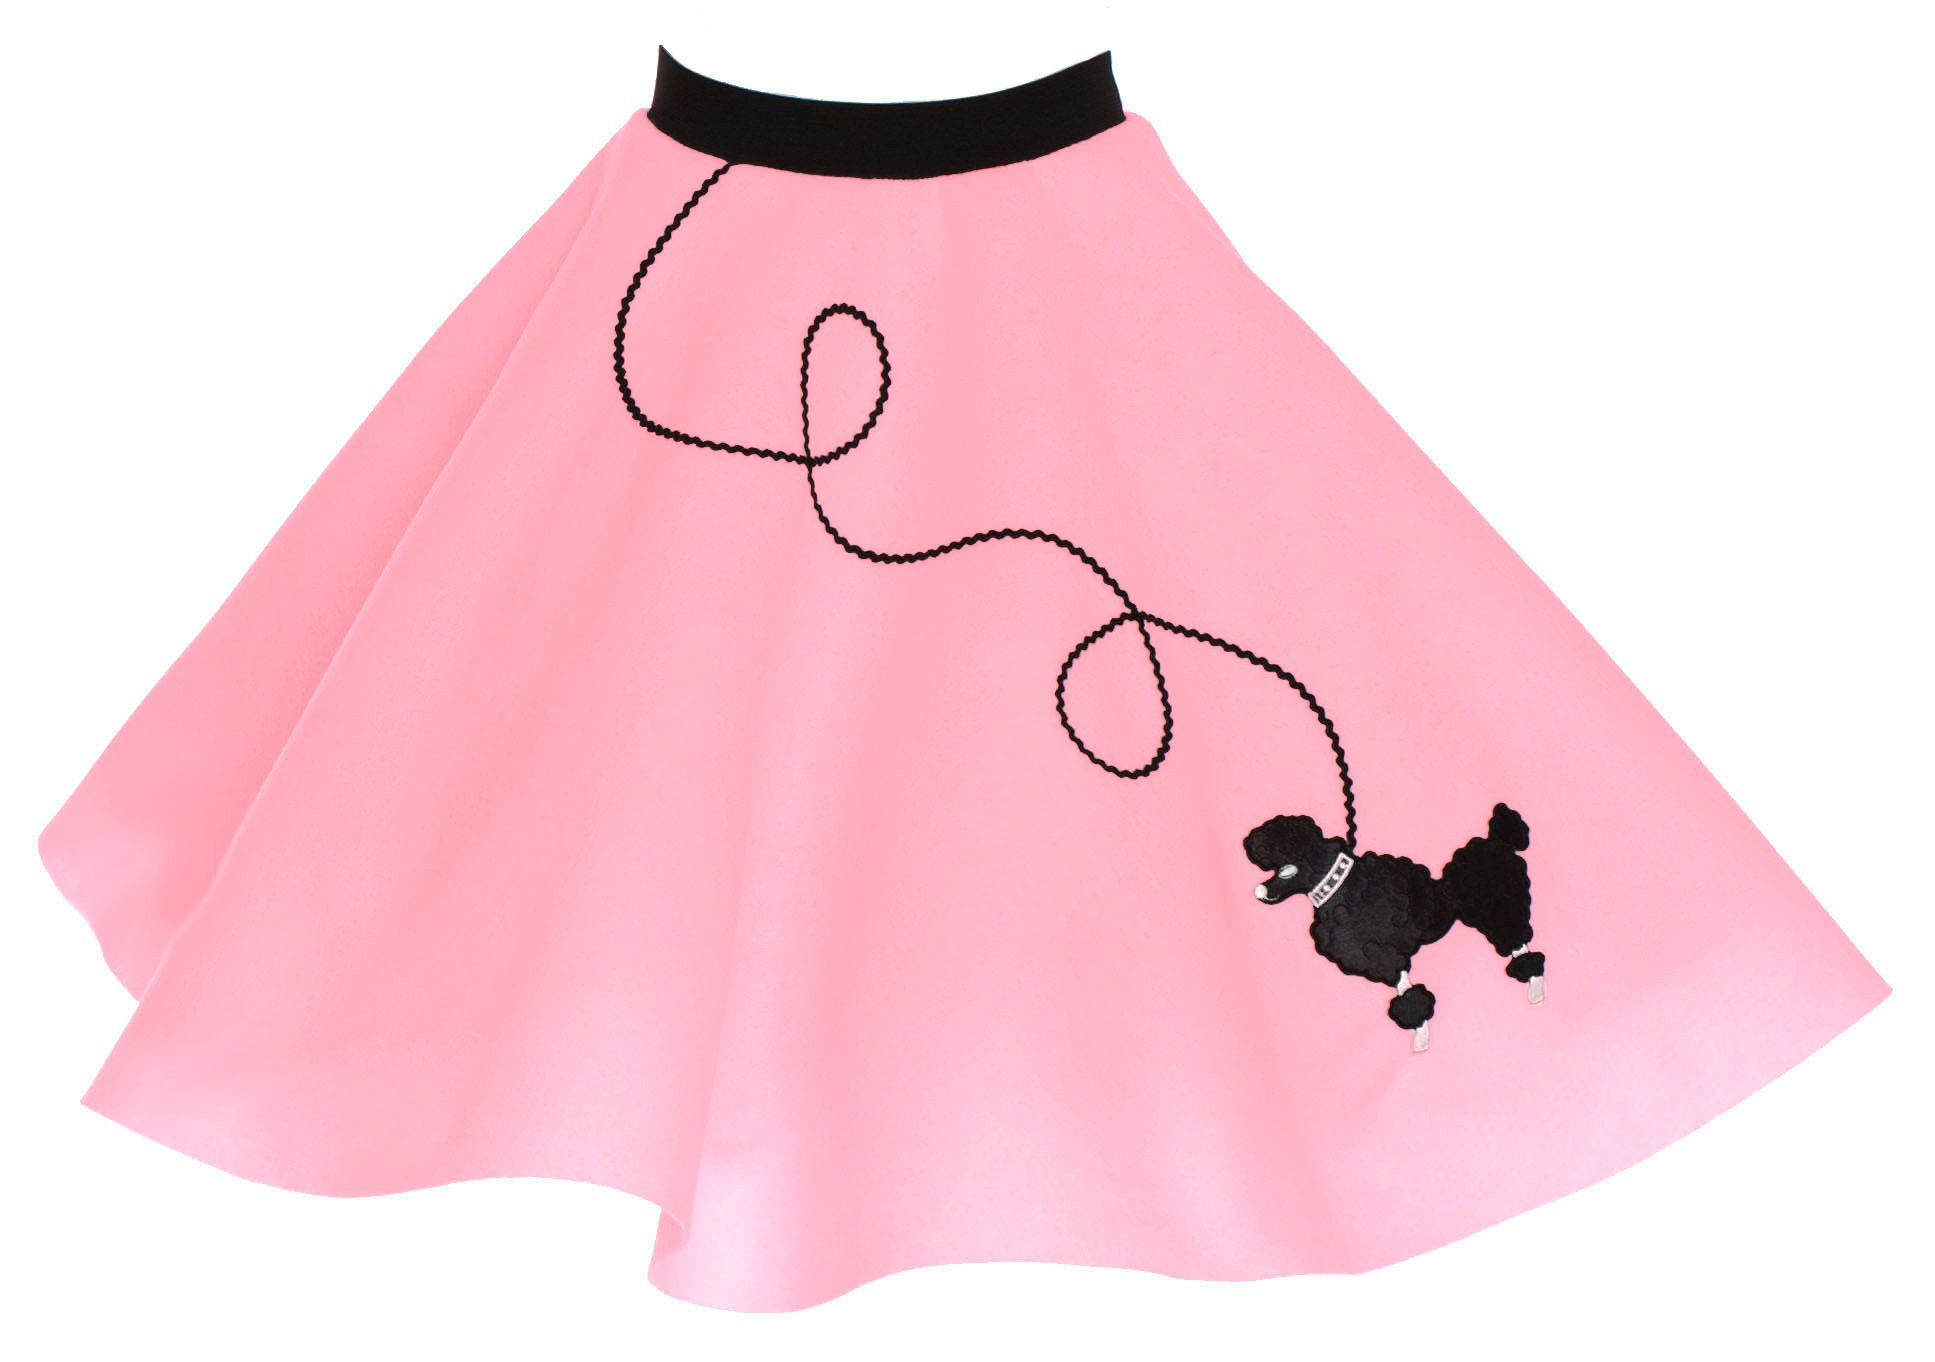 Poodle Skirt for Girls Size Large 10/11/12 Light Pink